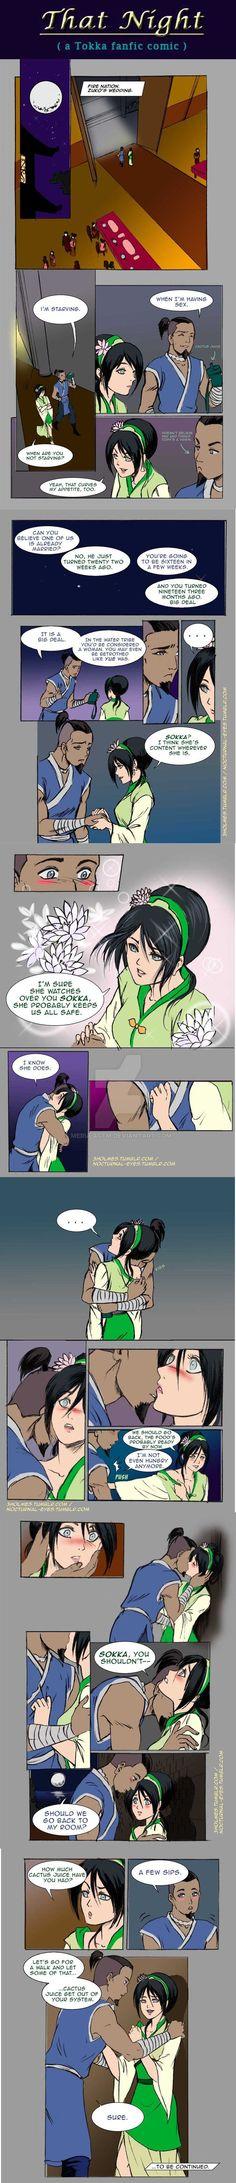 A Tokka FanFic Comic - THAT NIGHT, PART 01